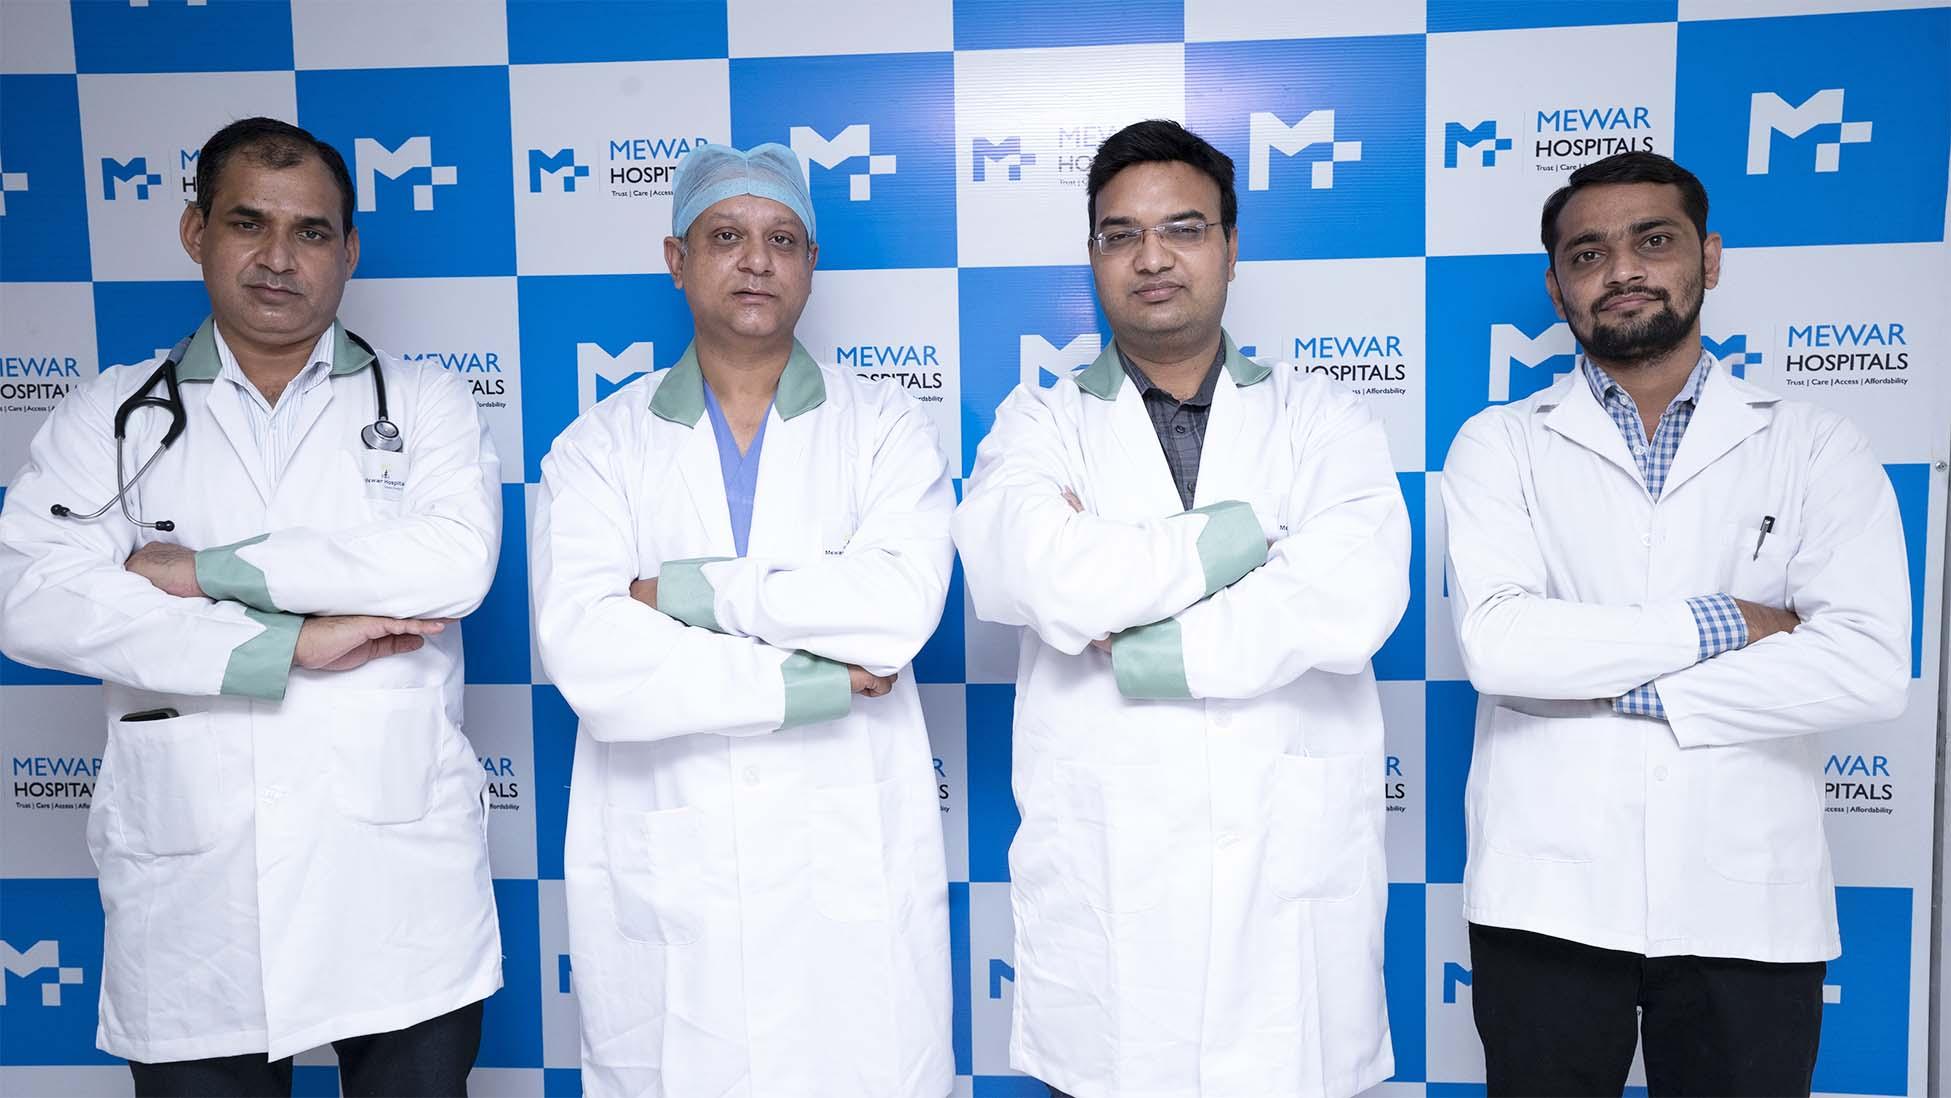 Mewar Hospitals team